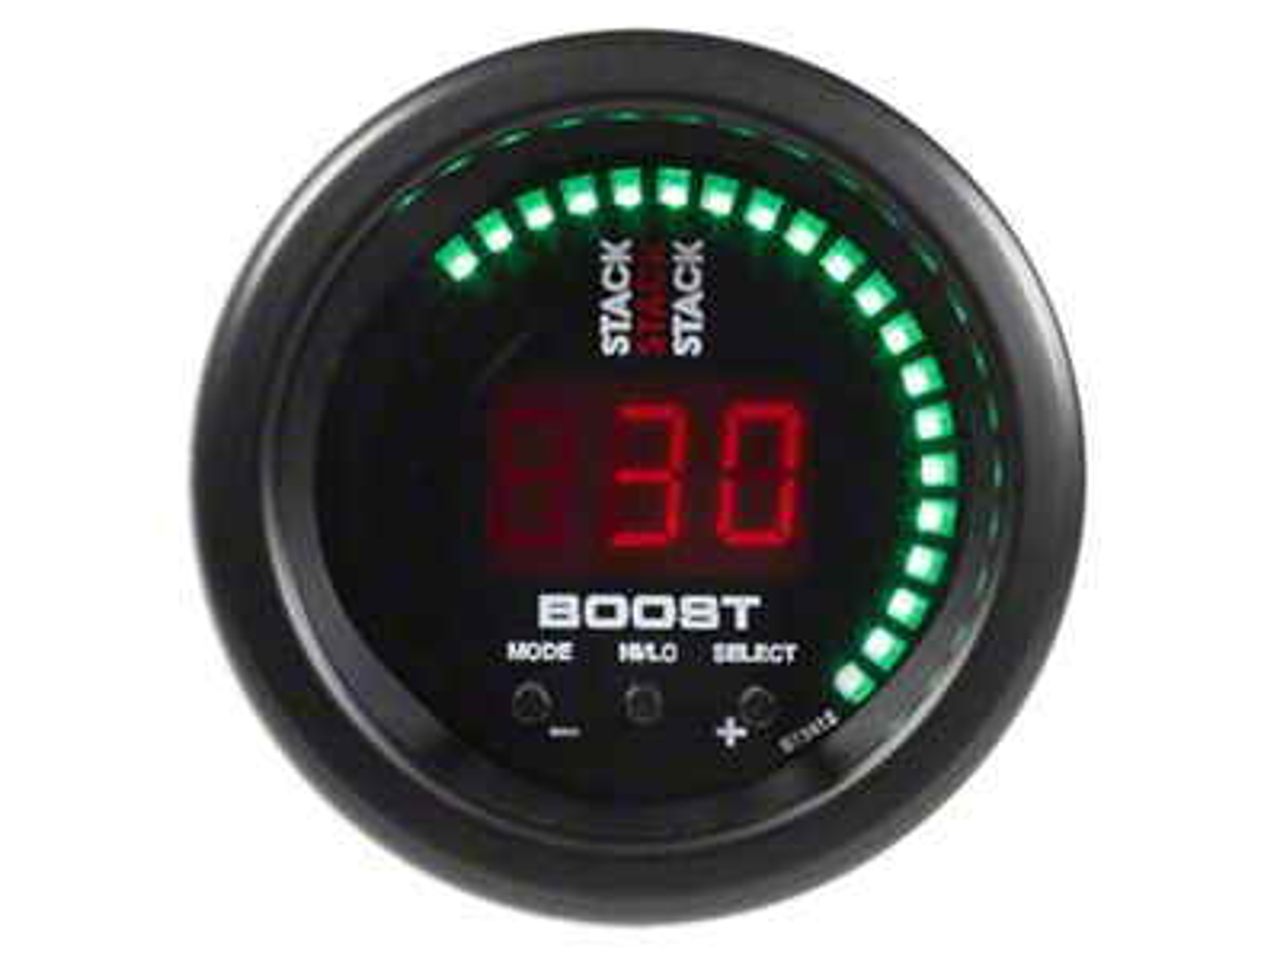 Auto Meter Stack Boost Controller Gauge - Black (08-18 All)